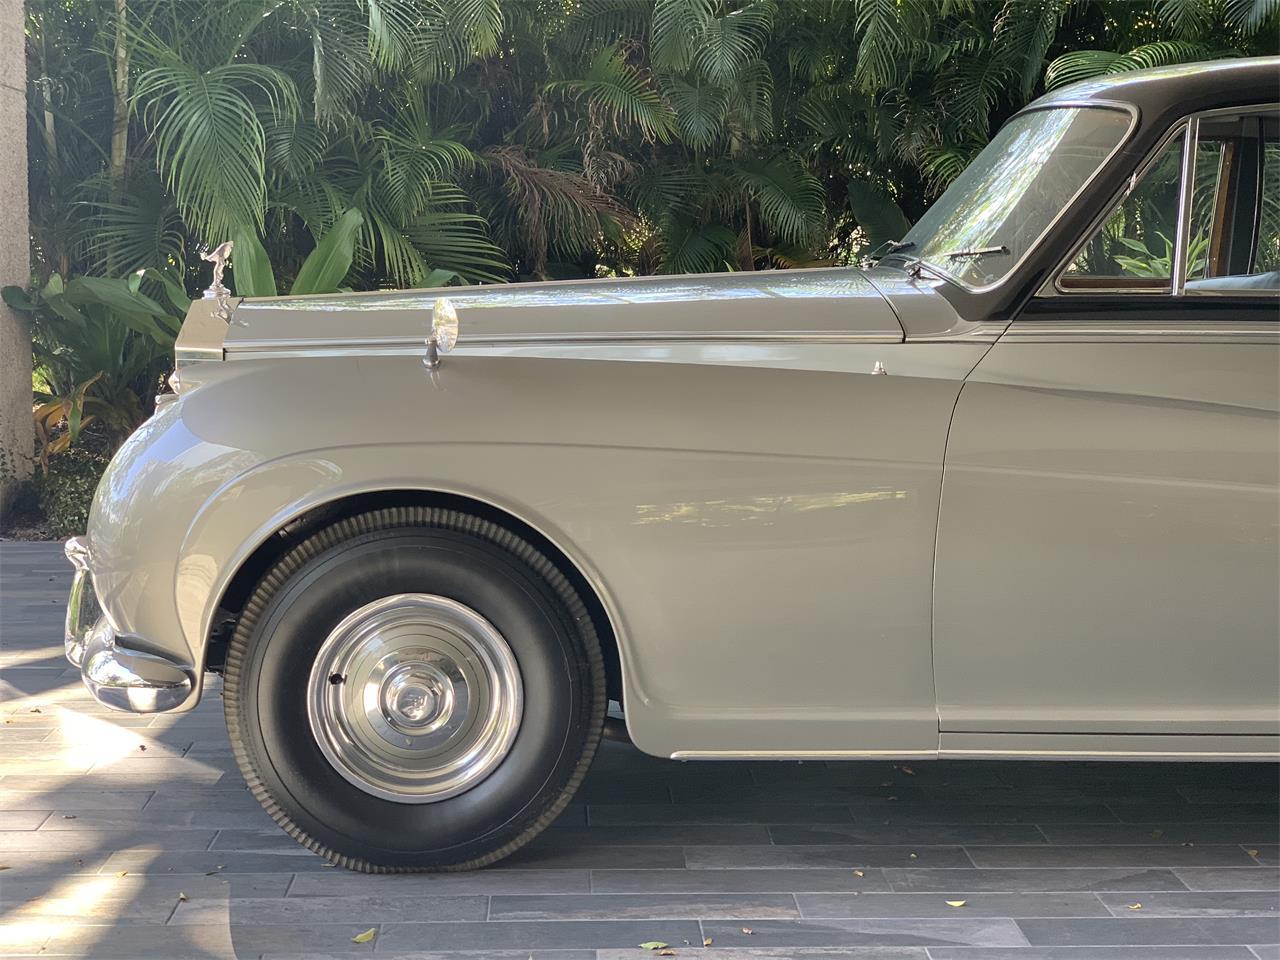 1961 Rolls-Royce Phantom (CC-1203188) for sale in BOCA RATON, Florida